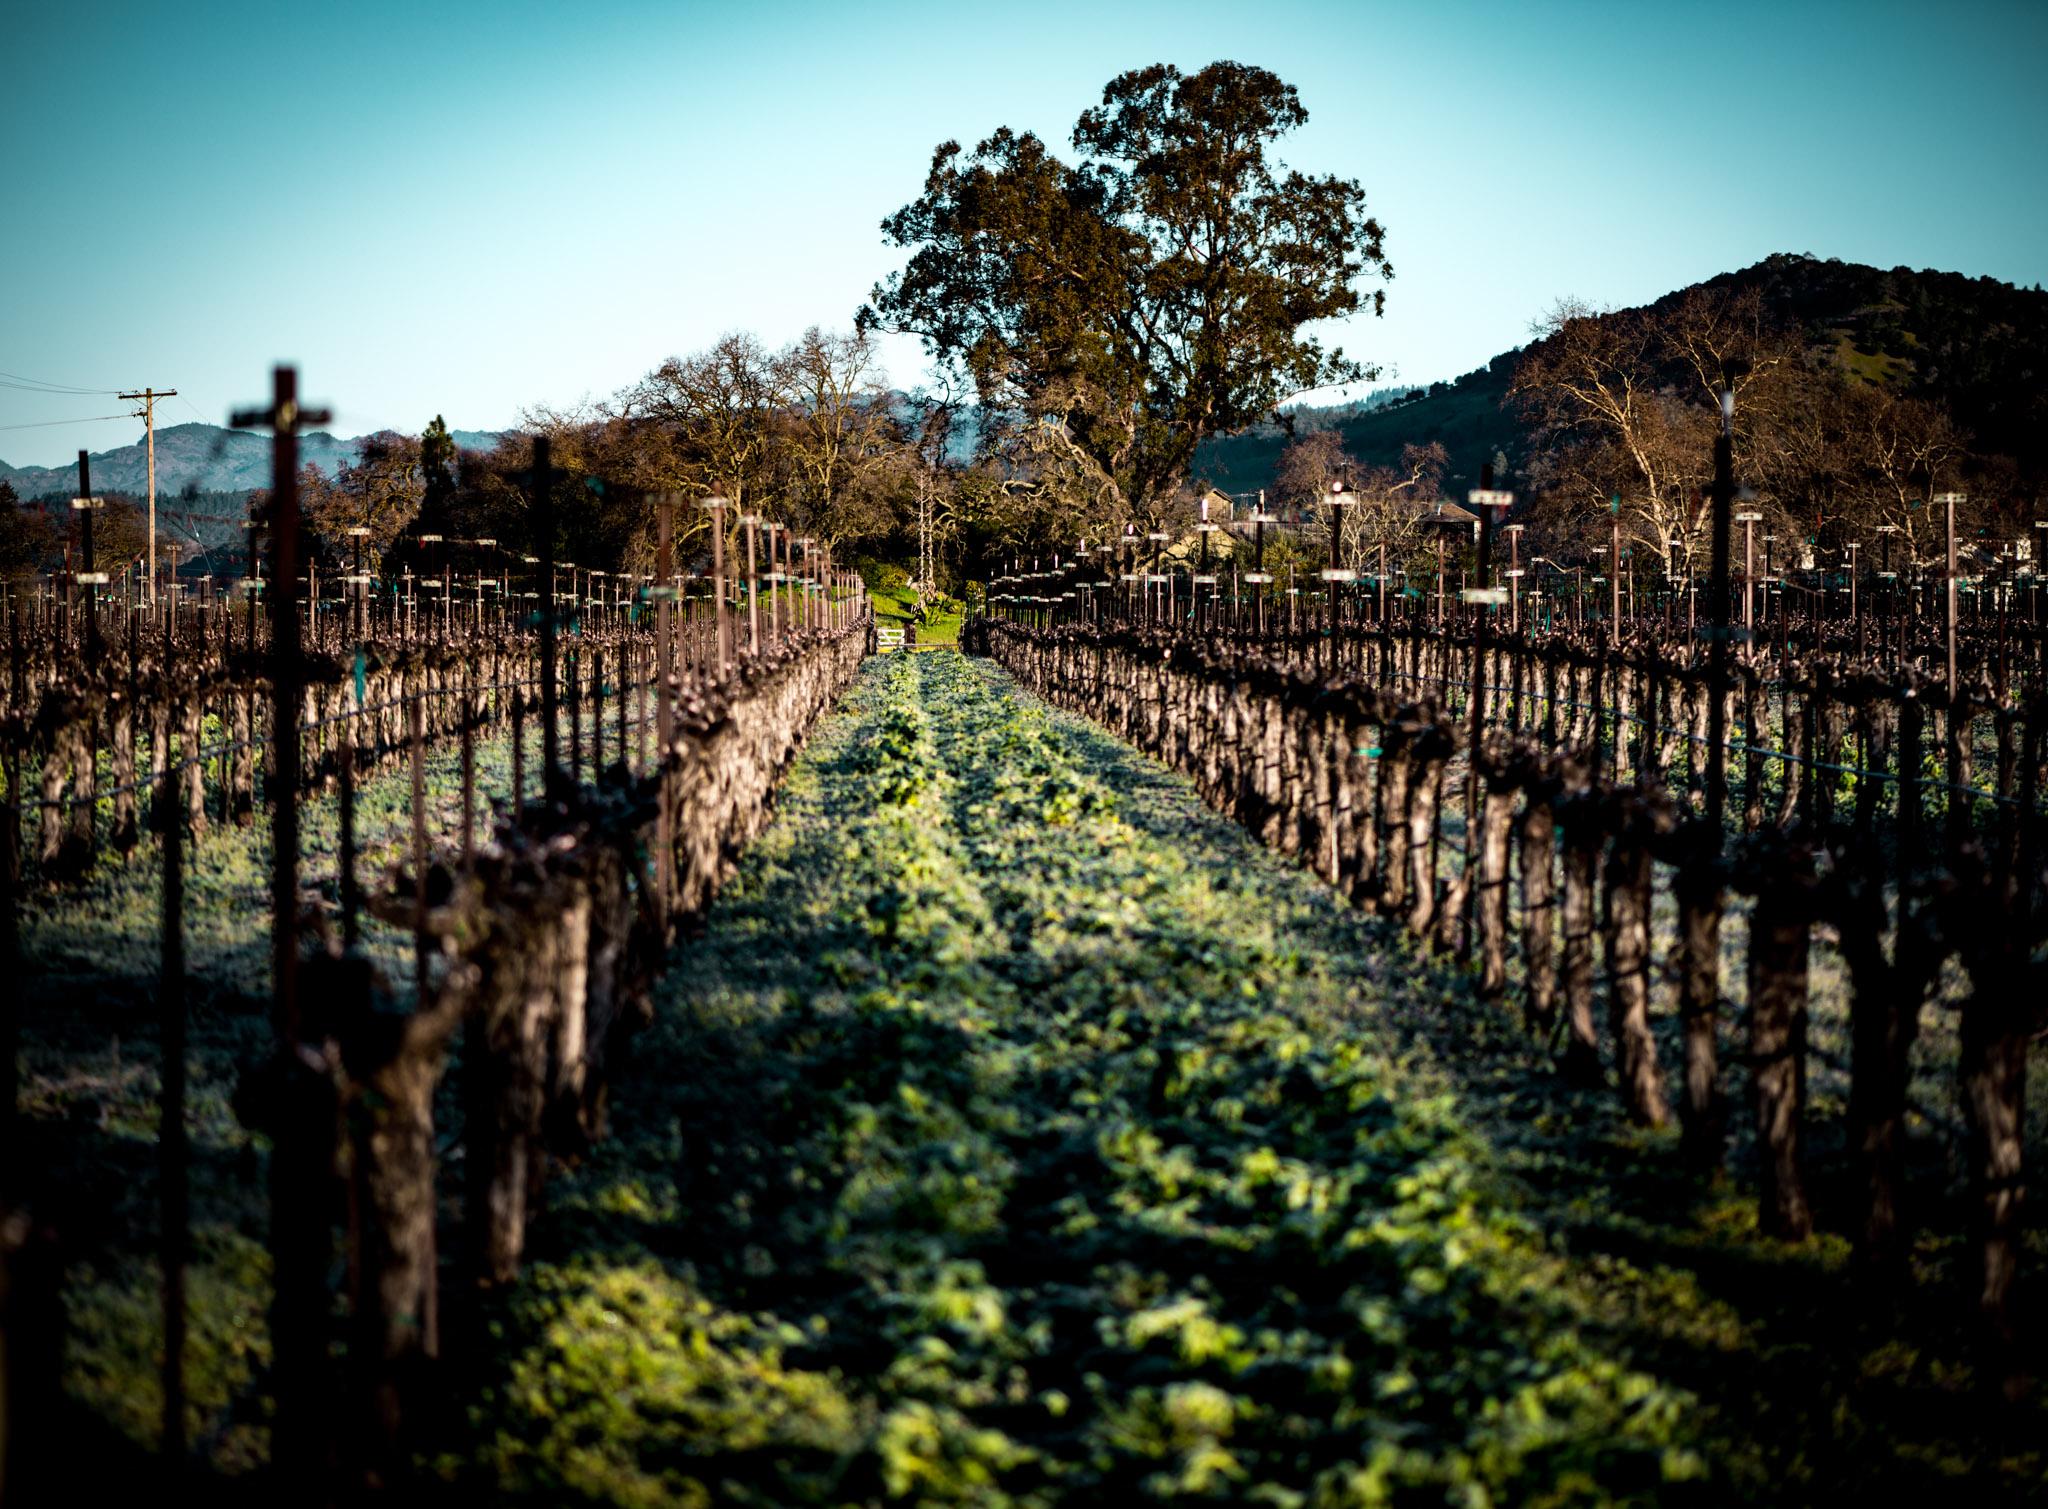 California : Napa Valley : Oakville Crossroad